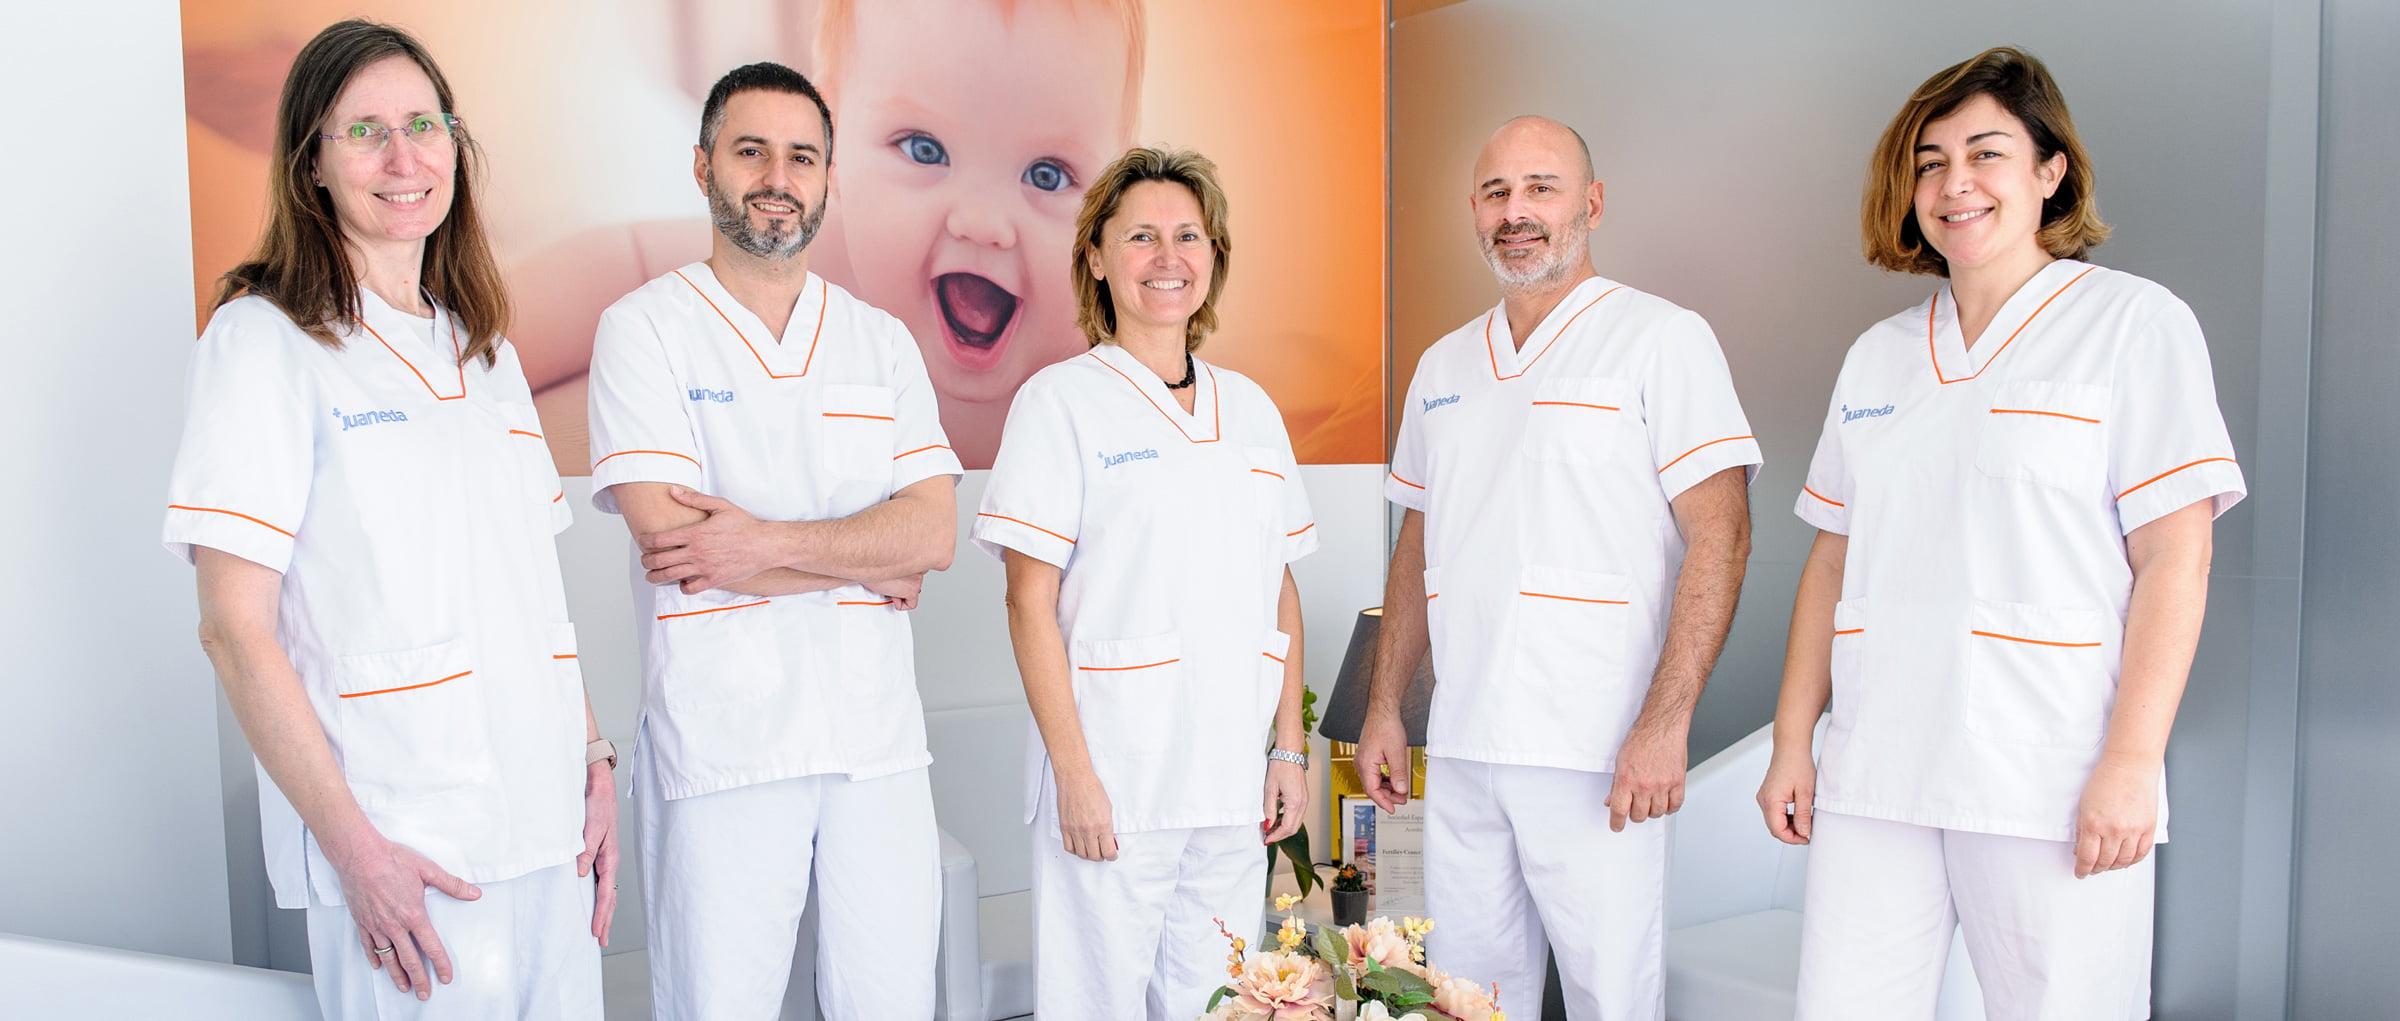 Equipo médico de Juaneda